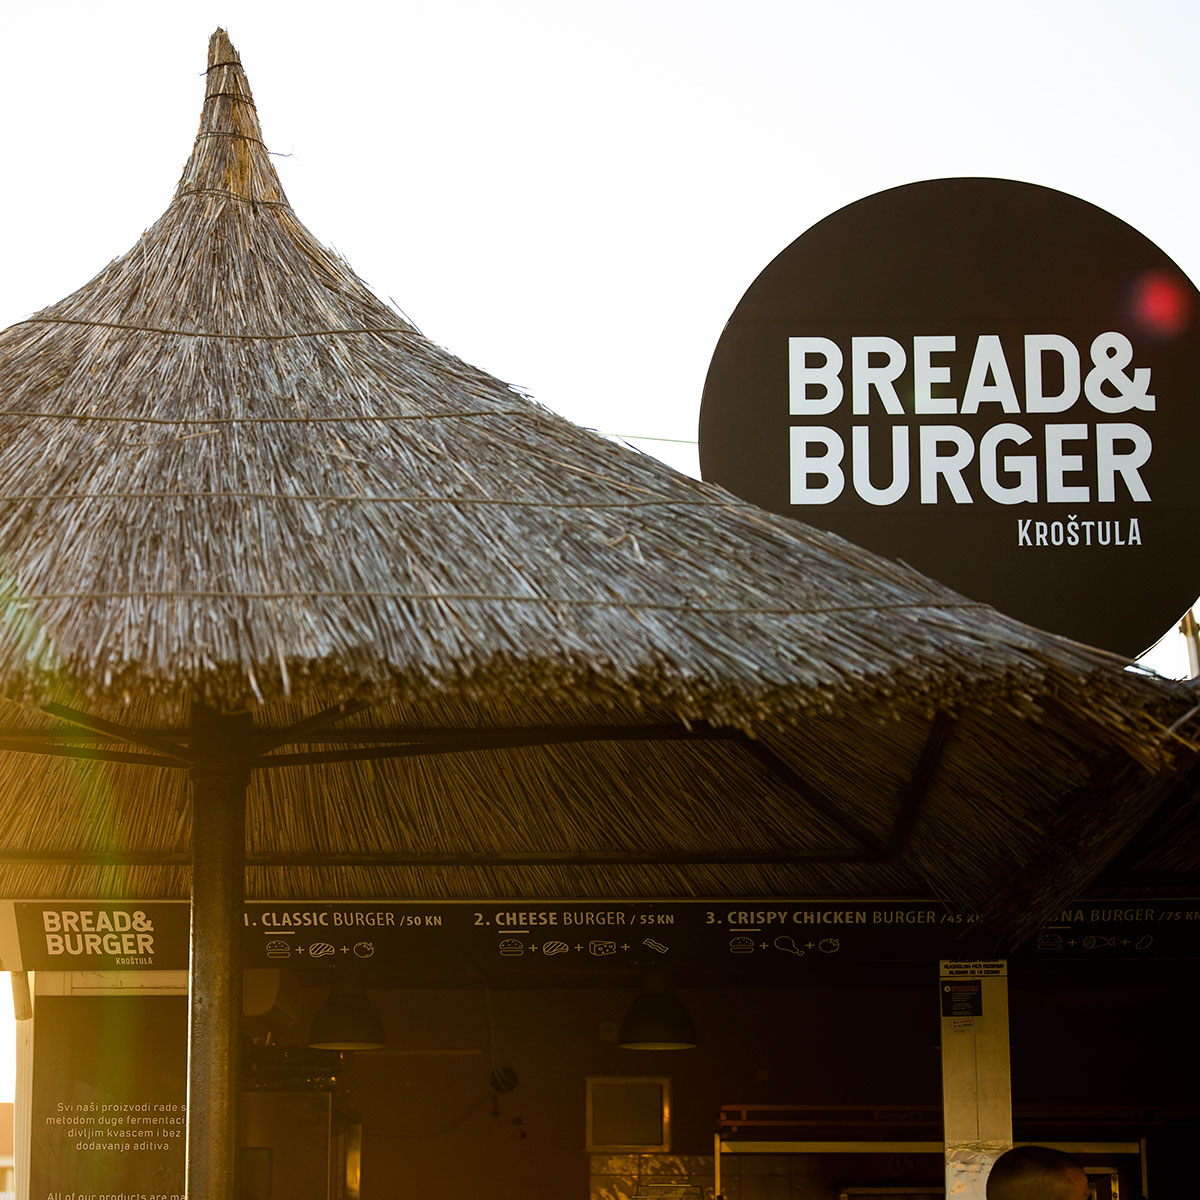 Bread & burger by Kroštula Pakoštane